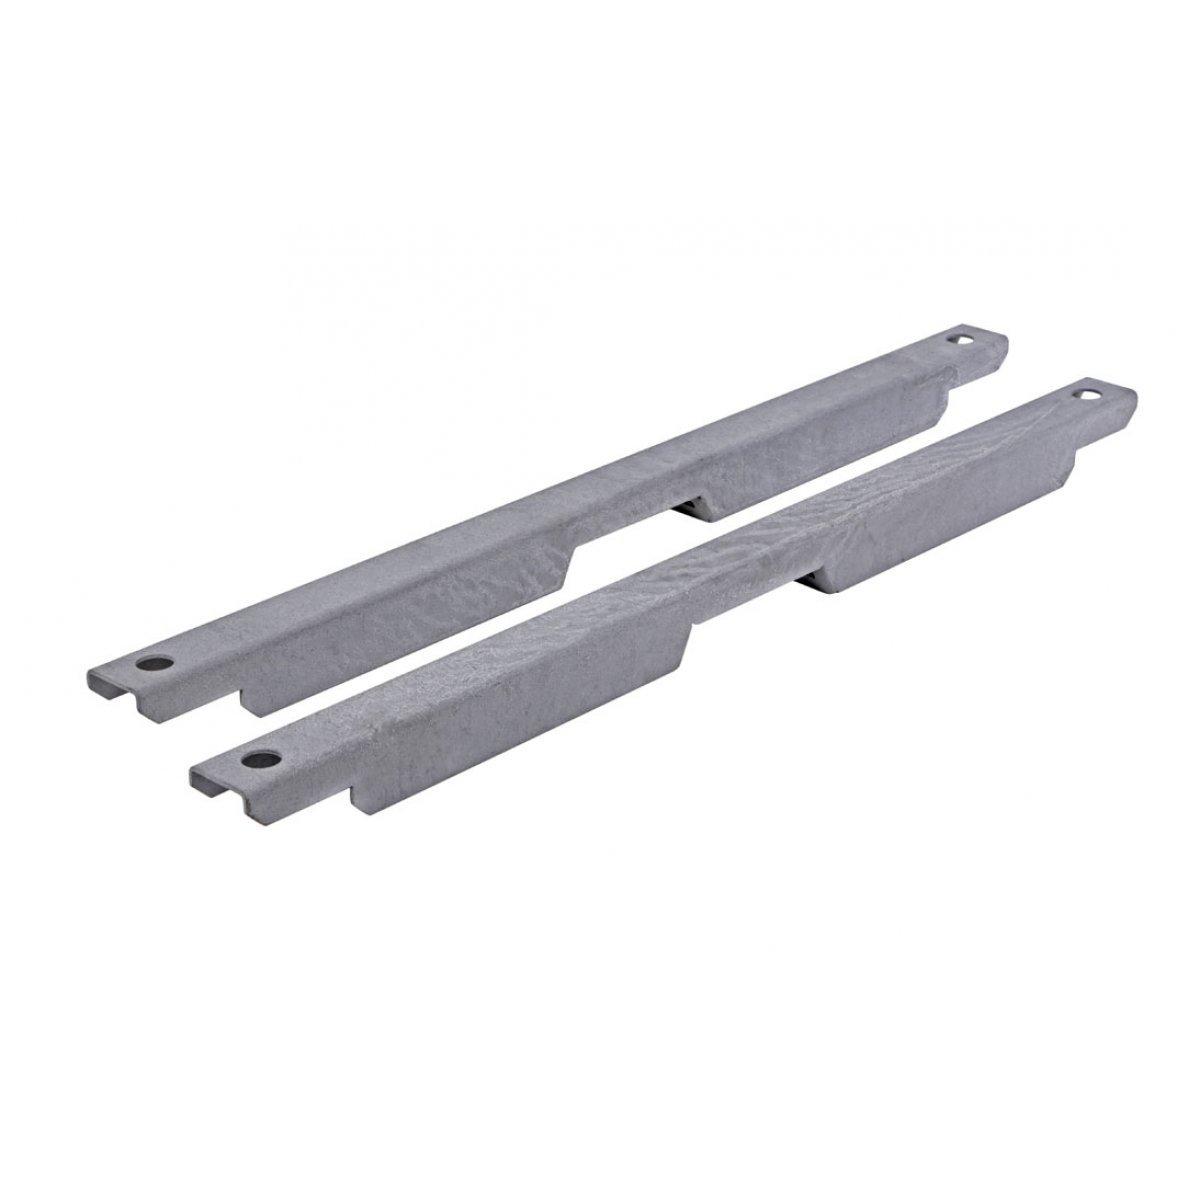 Комплект крепления на столб для шкафа ШКТ-НВ ССД